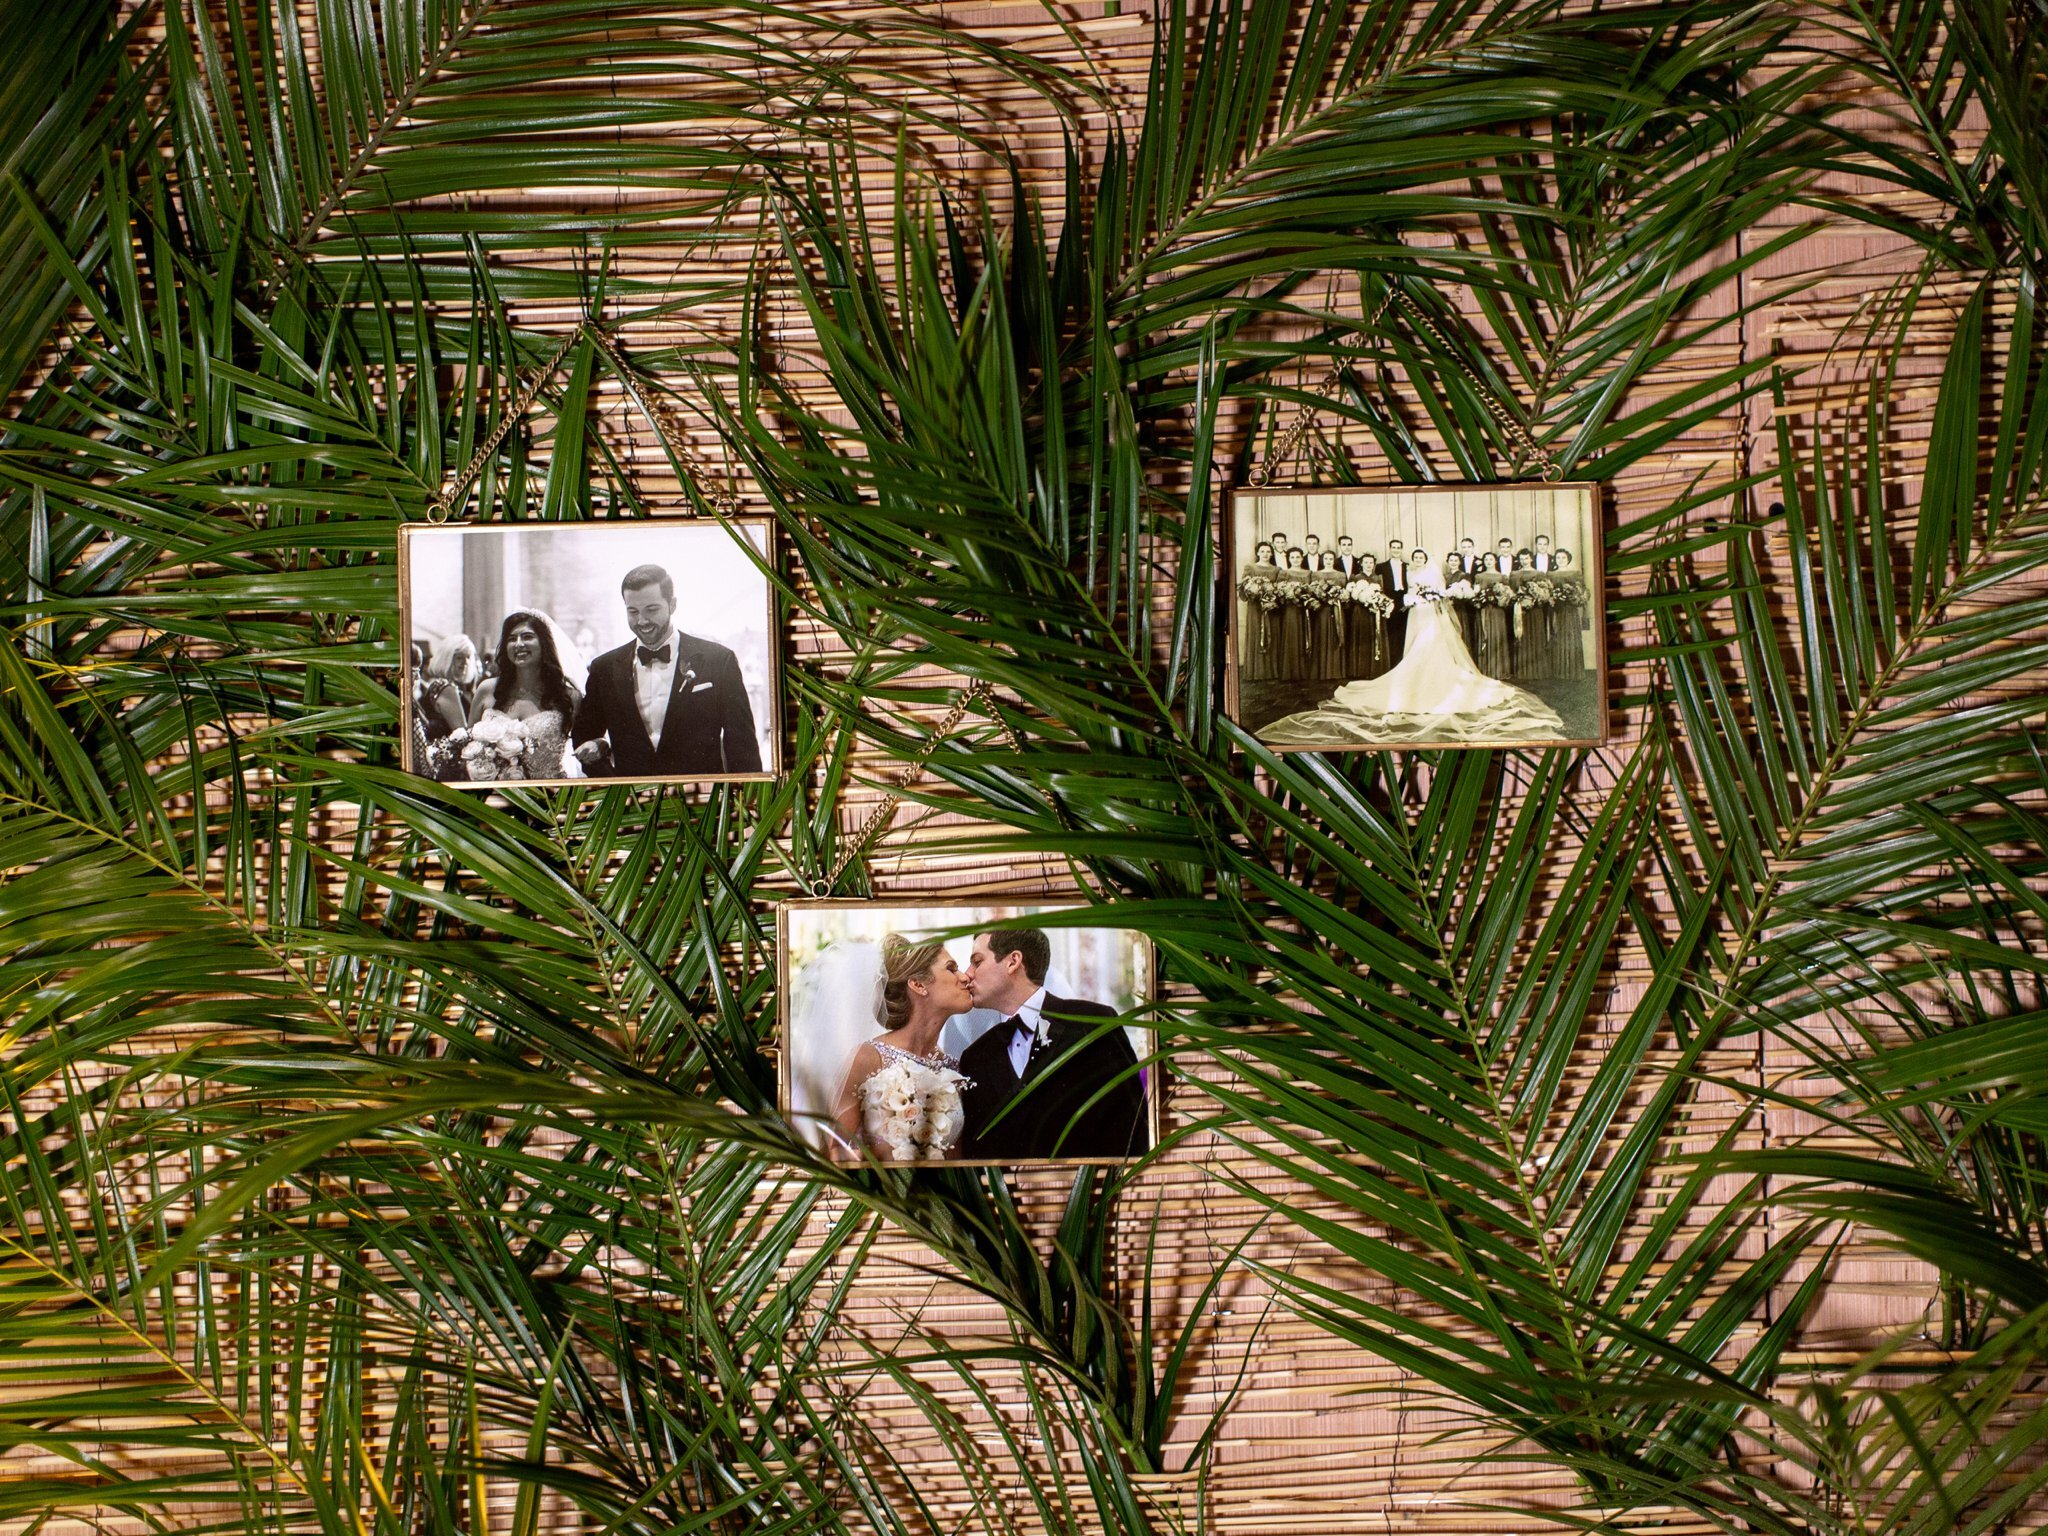 jw marriott marco island wedding photographer marco island wedding photographer shannon griffin photography_0154.jpg